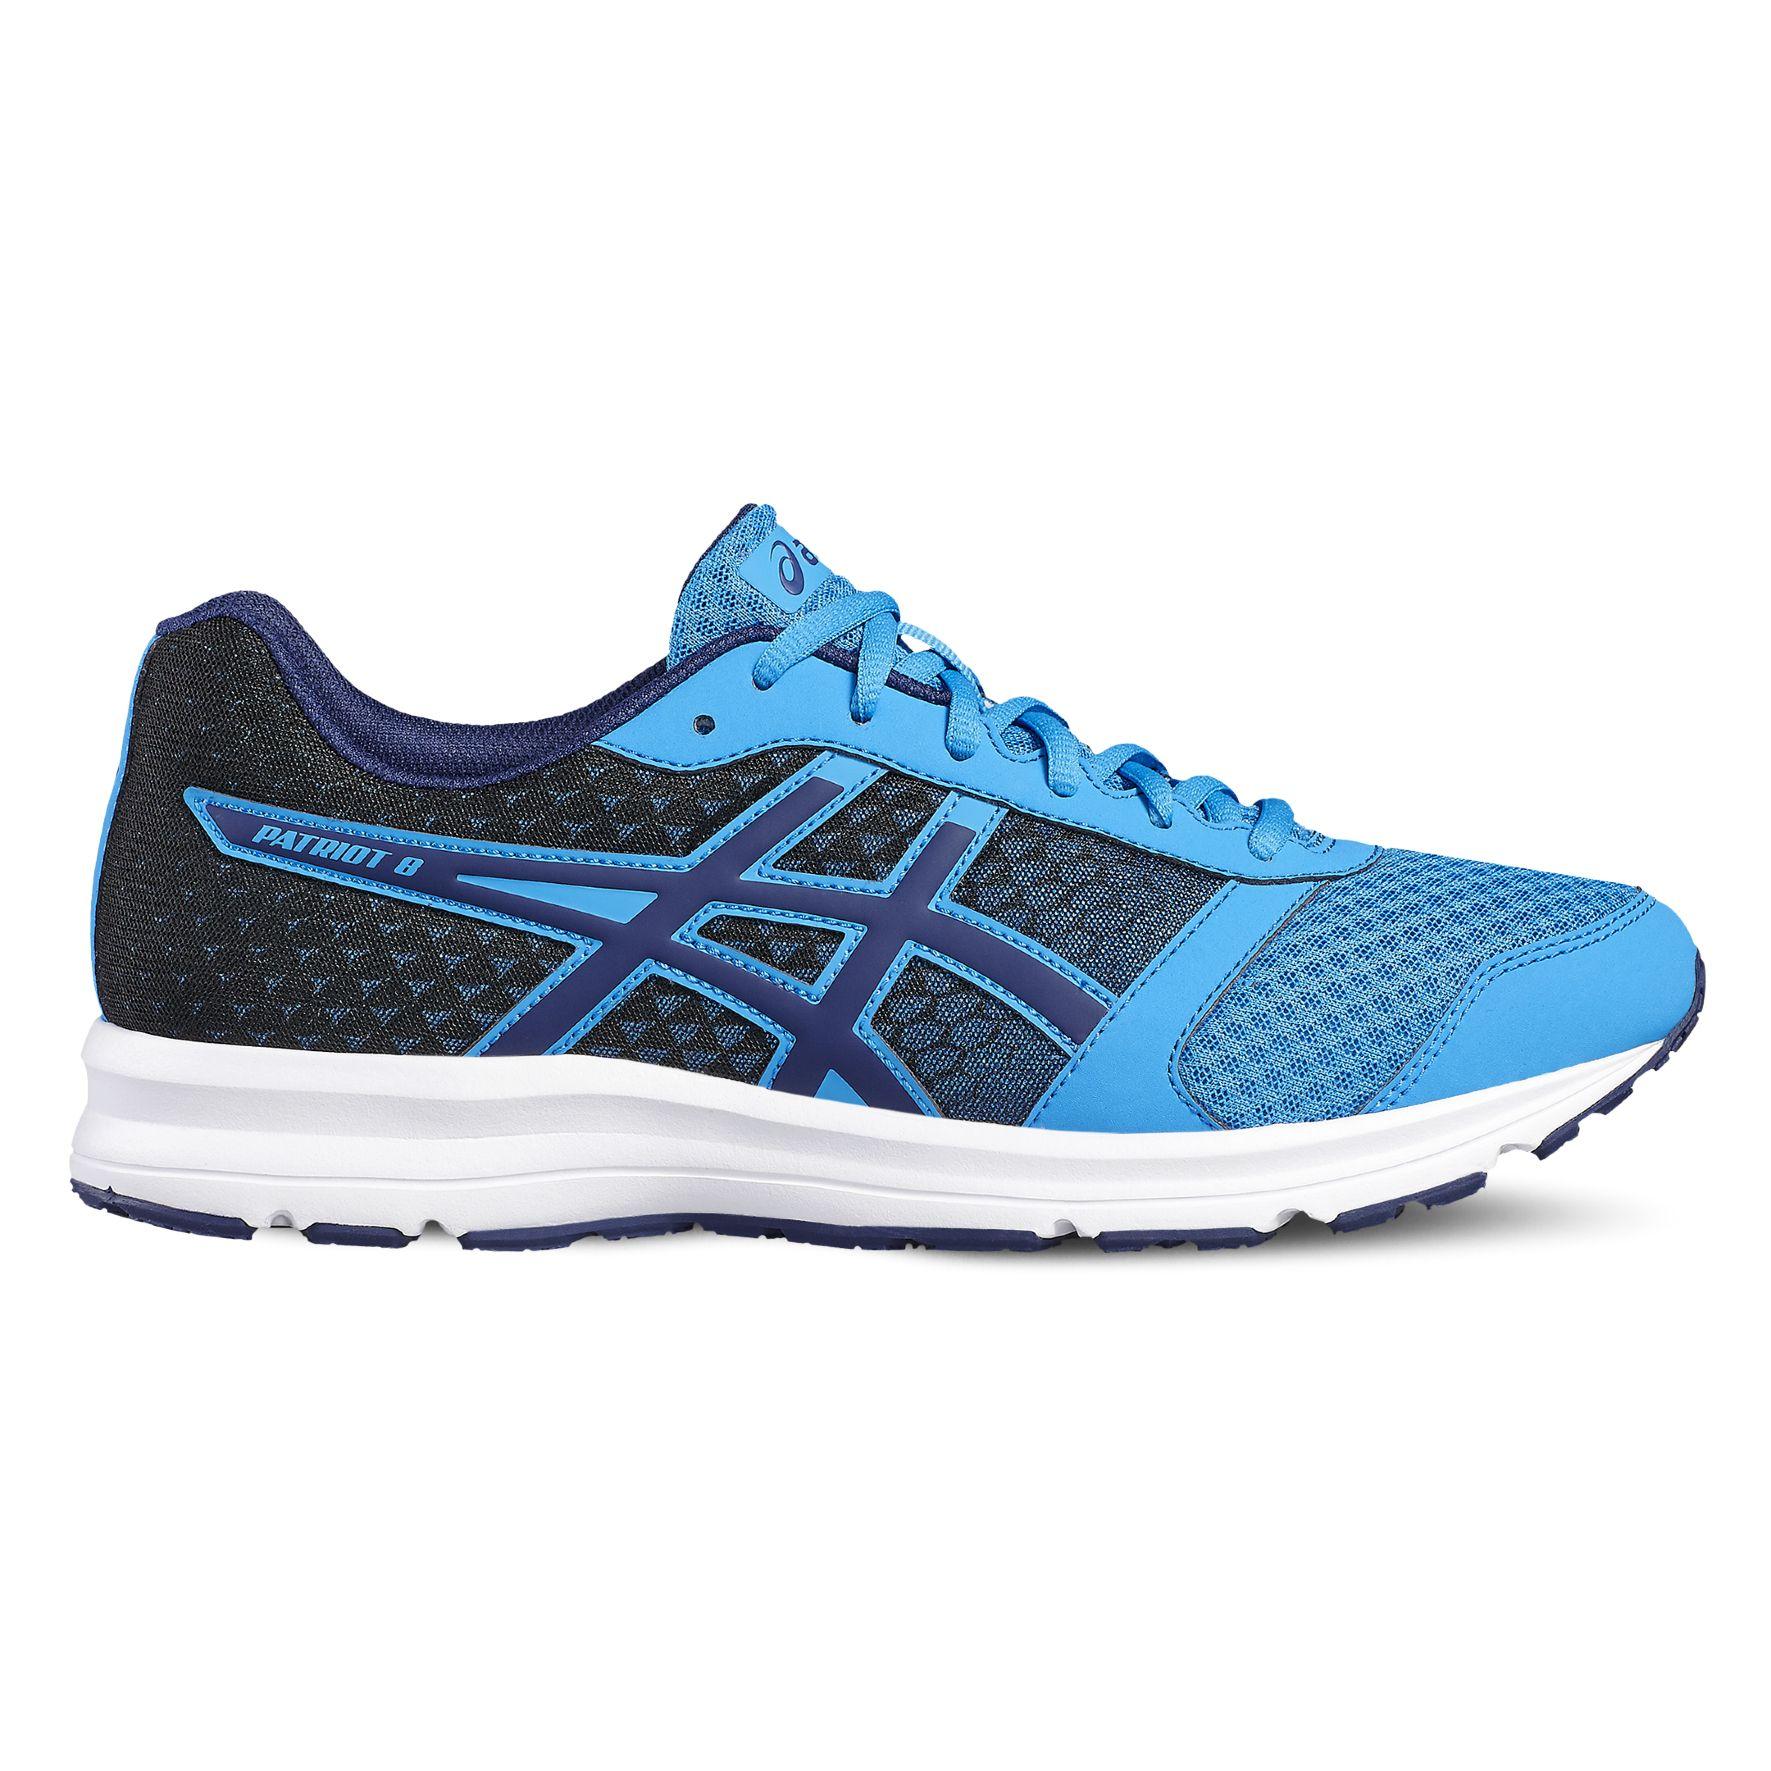 Proper Shoe Size For Running